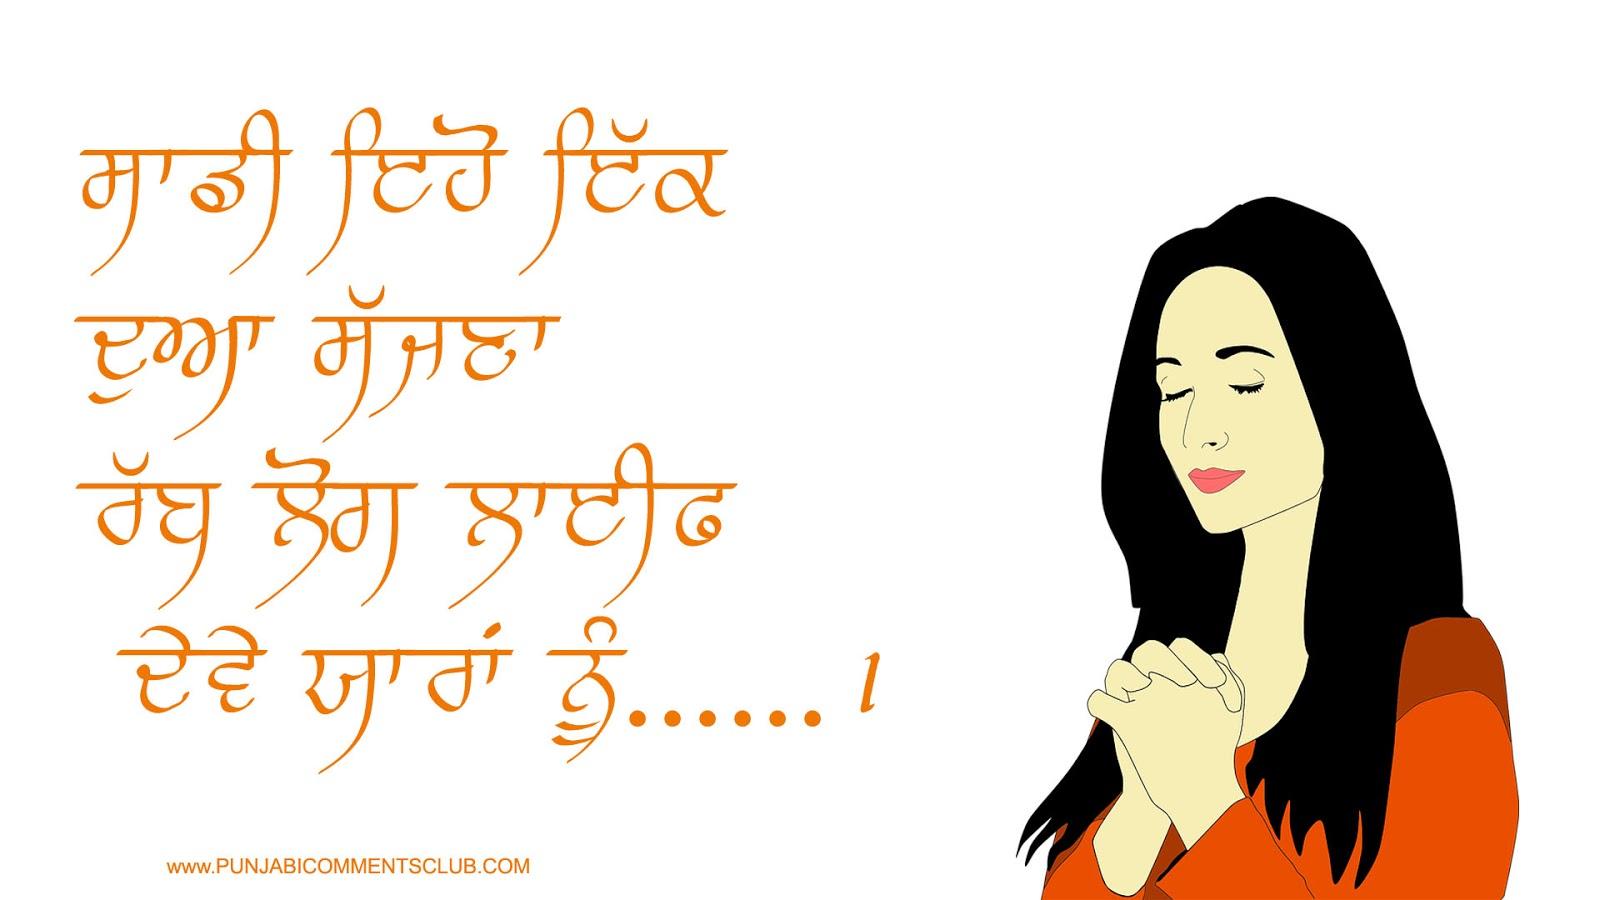 Girl friend Punjabi status ਸਾਡੀ ਇਹੋ ਇਕ